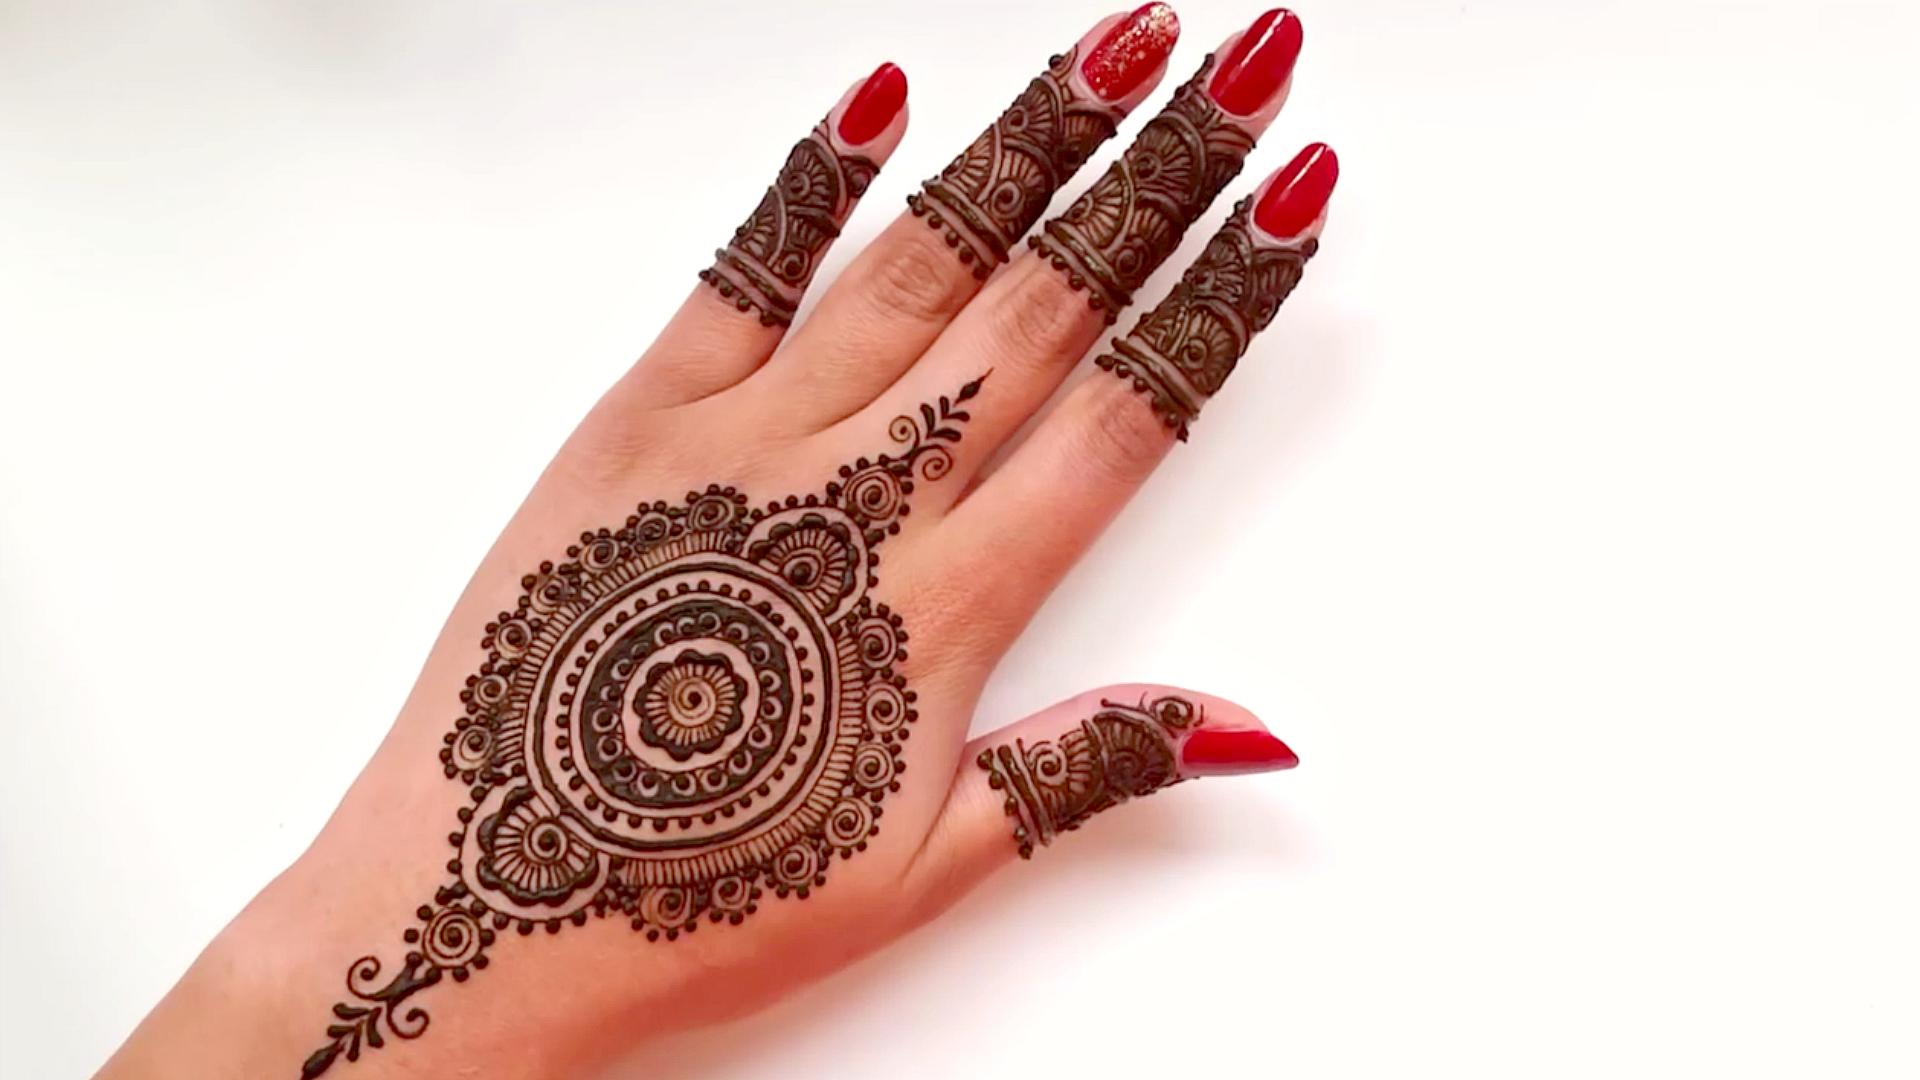 Mehndi Tattoo Hd : Intricate mandal bridal henna tattoo design beautiful and simple